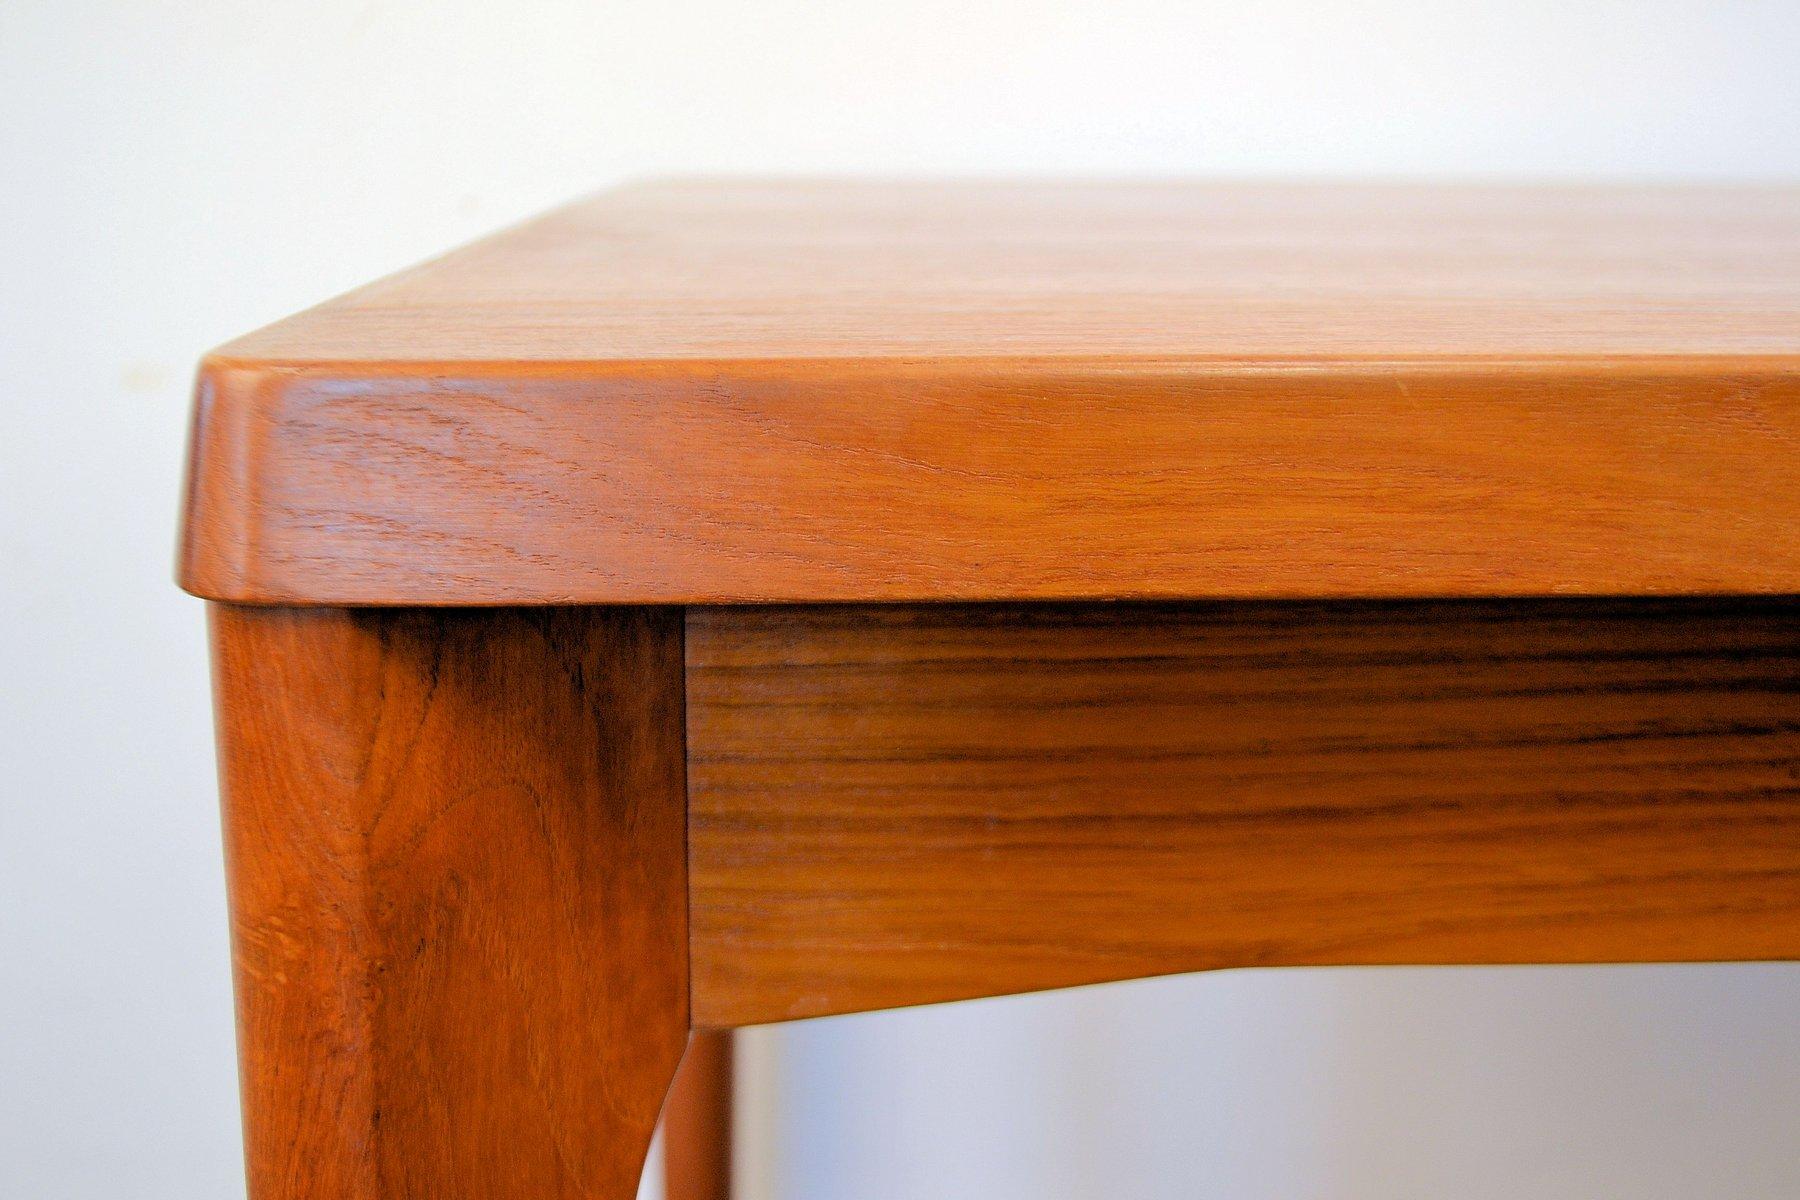 Danish Teak Extendable Dining Table by Henning Kjaernulf  : danish teak extendable dining table by henning kjaernulf for vejle stole mobelfabrik 1960s 4 from www.pamono.eu size 1800 x 1200 jpeg 144kB